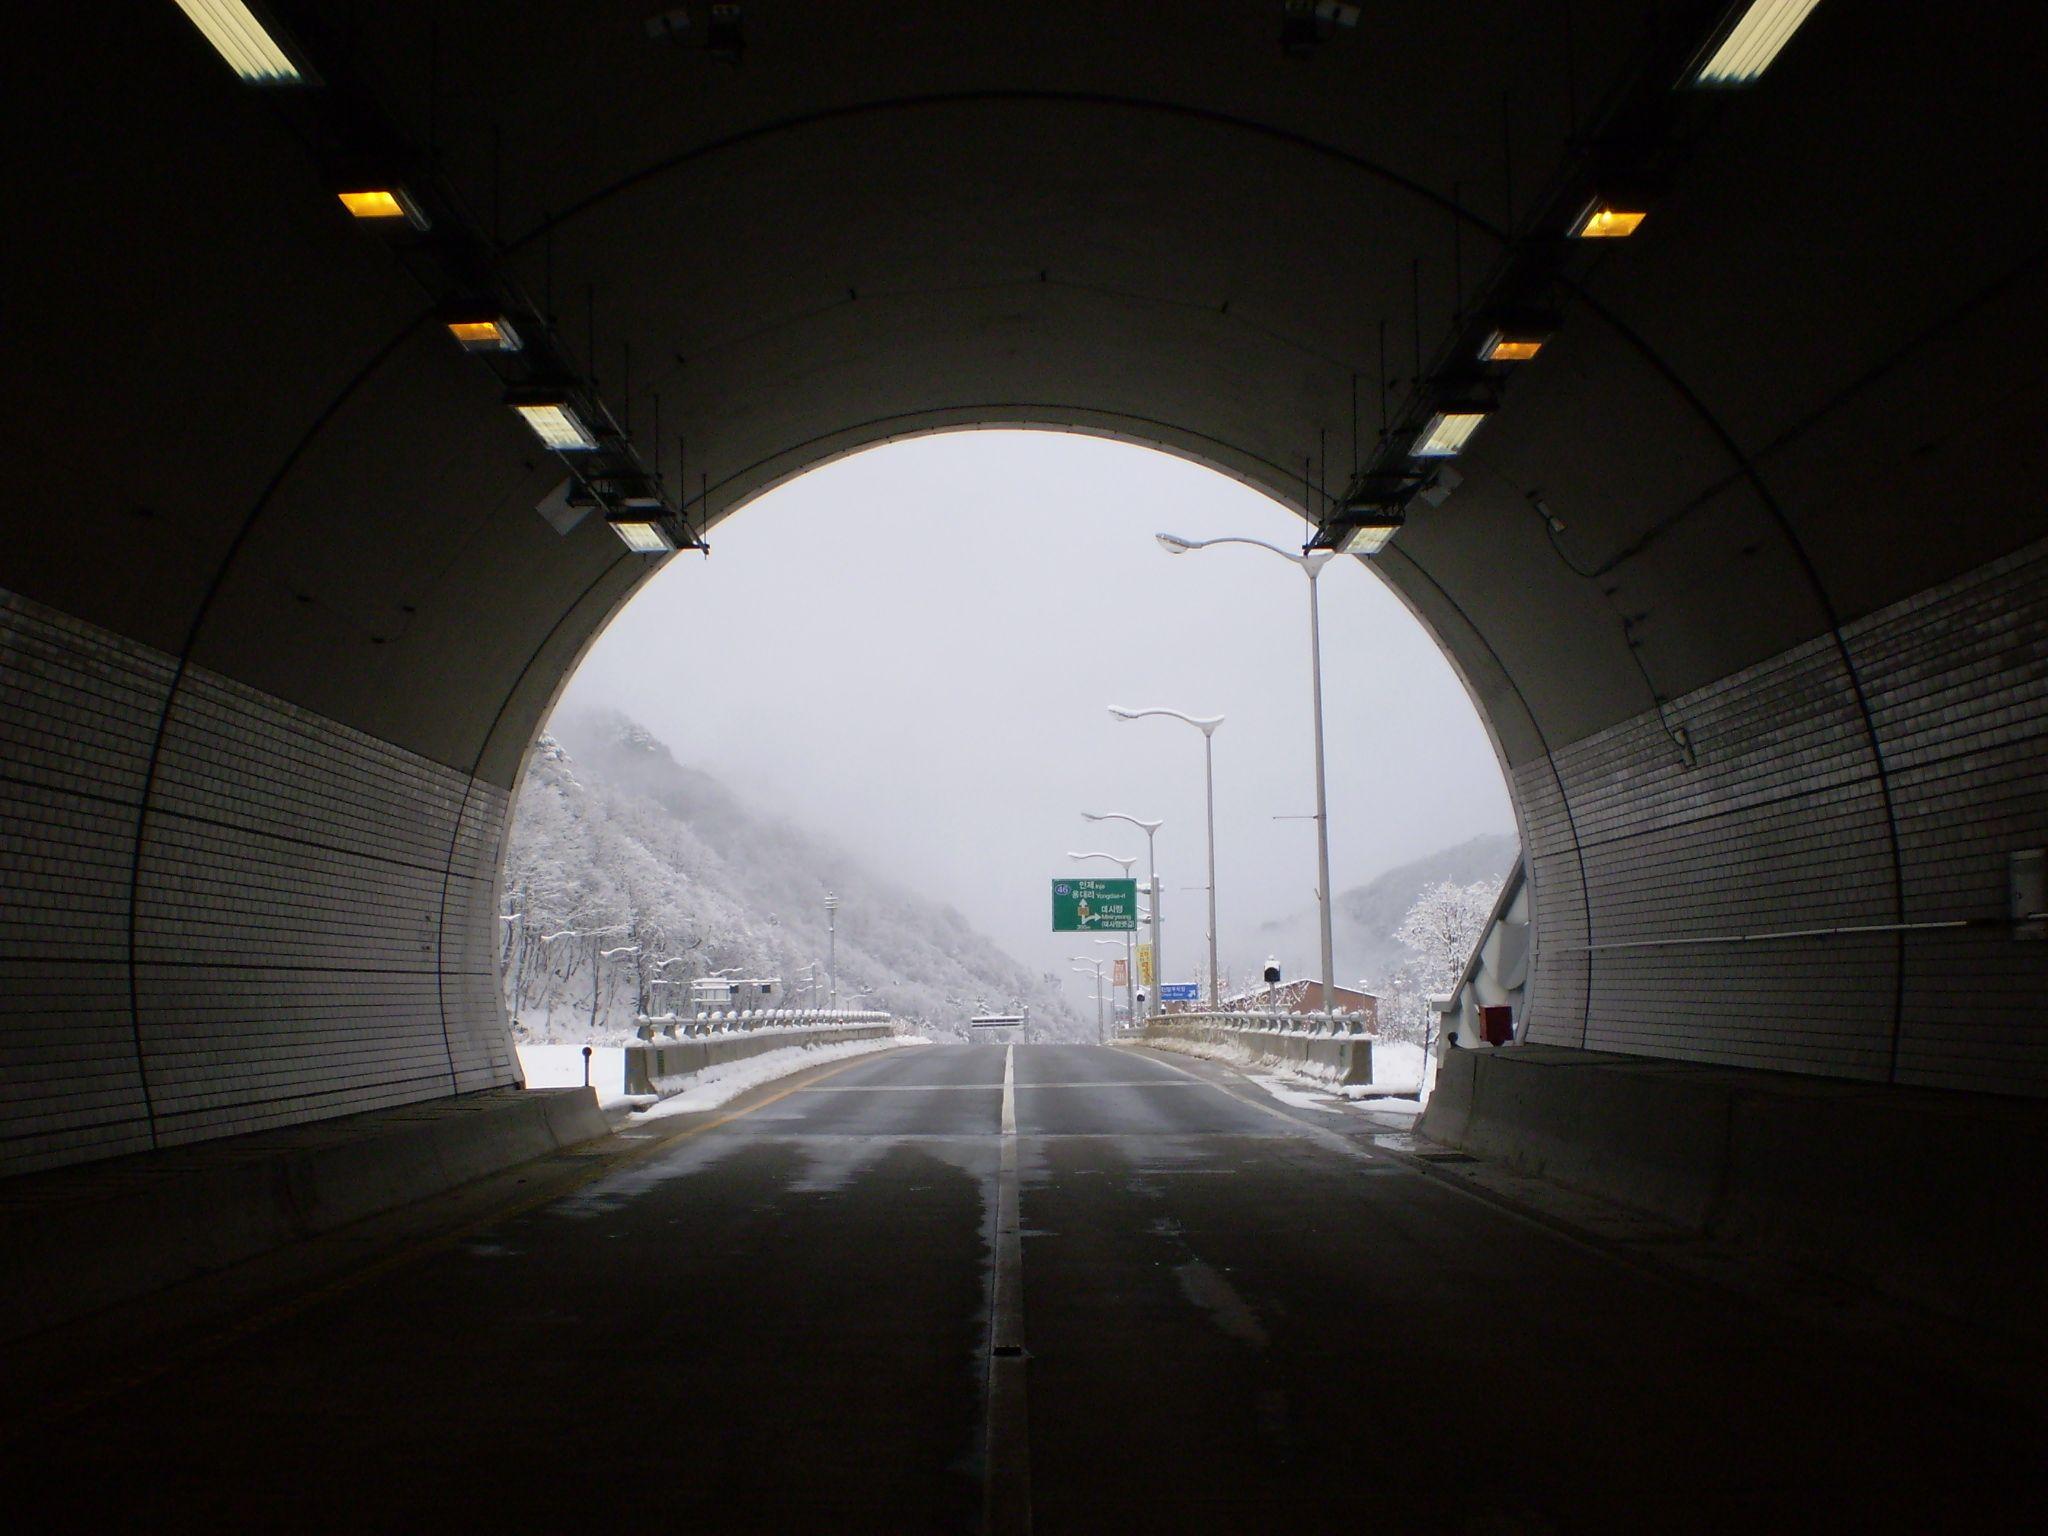 Misiryeong Tunnel, Sokcho, Korea   미시령 터널